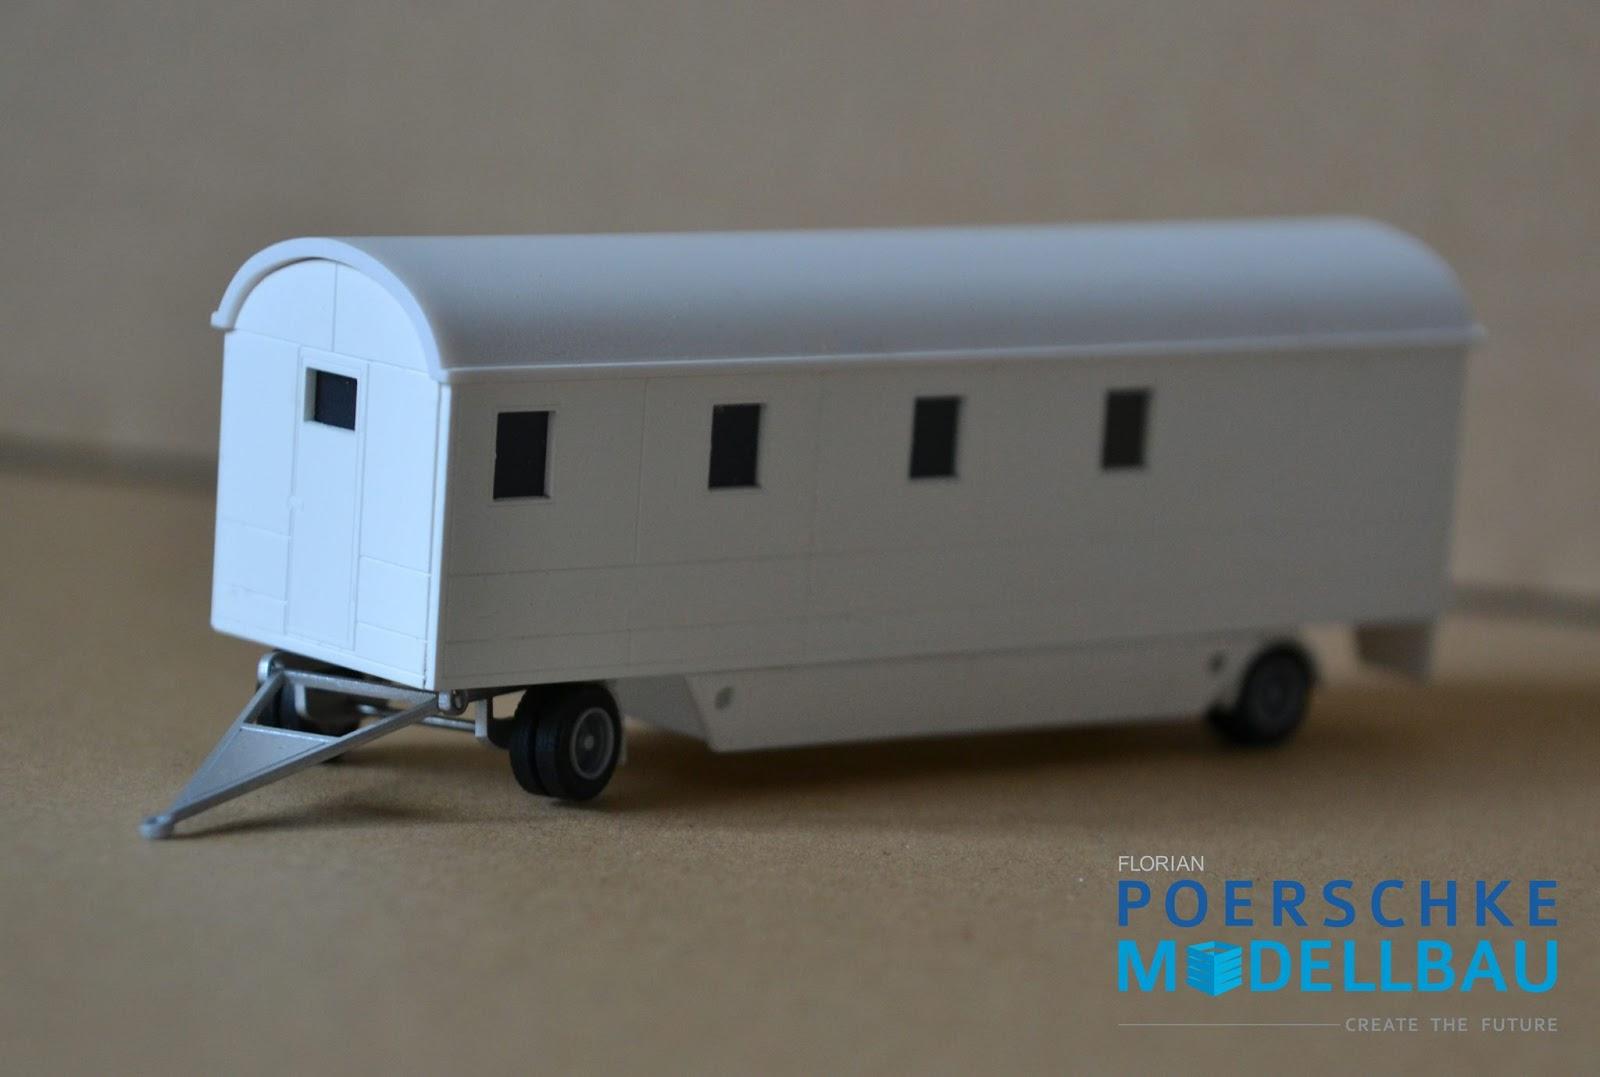 circusmodellbau poerschke modellbau neuheiten 2017. Black Bedroom Furniture Sets. Home Design Ideas